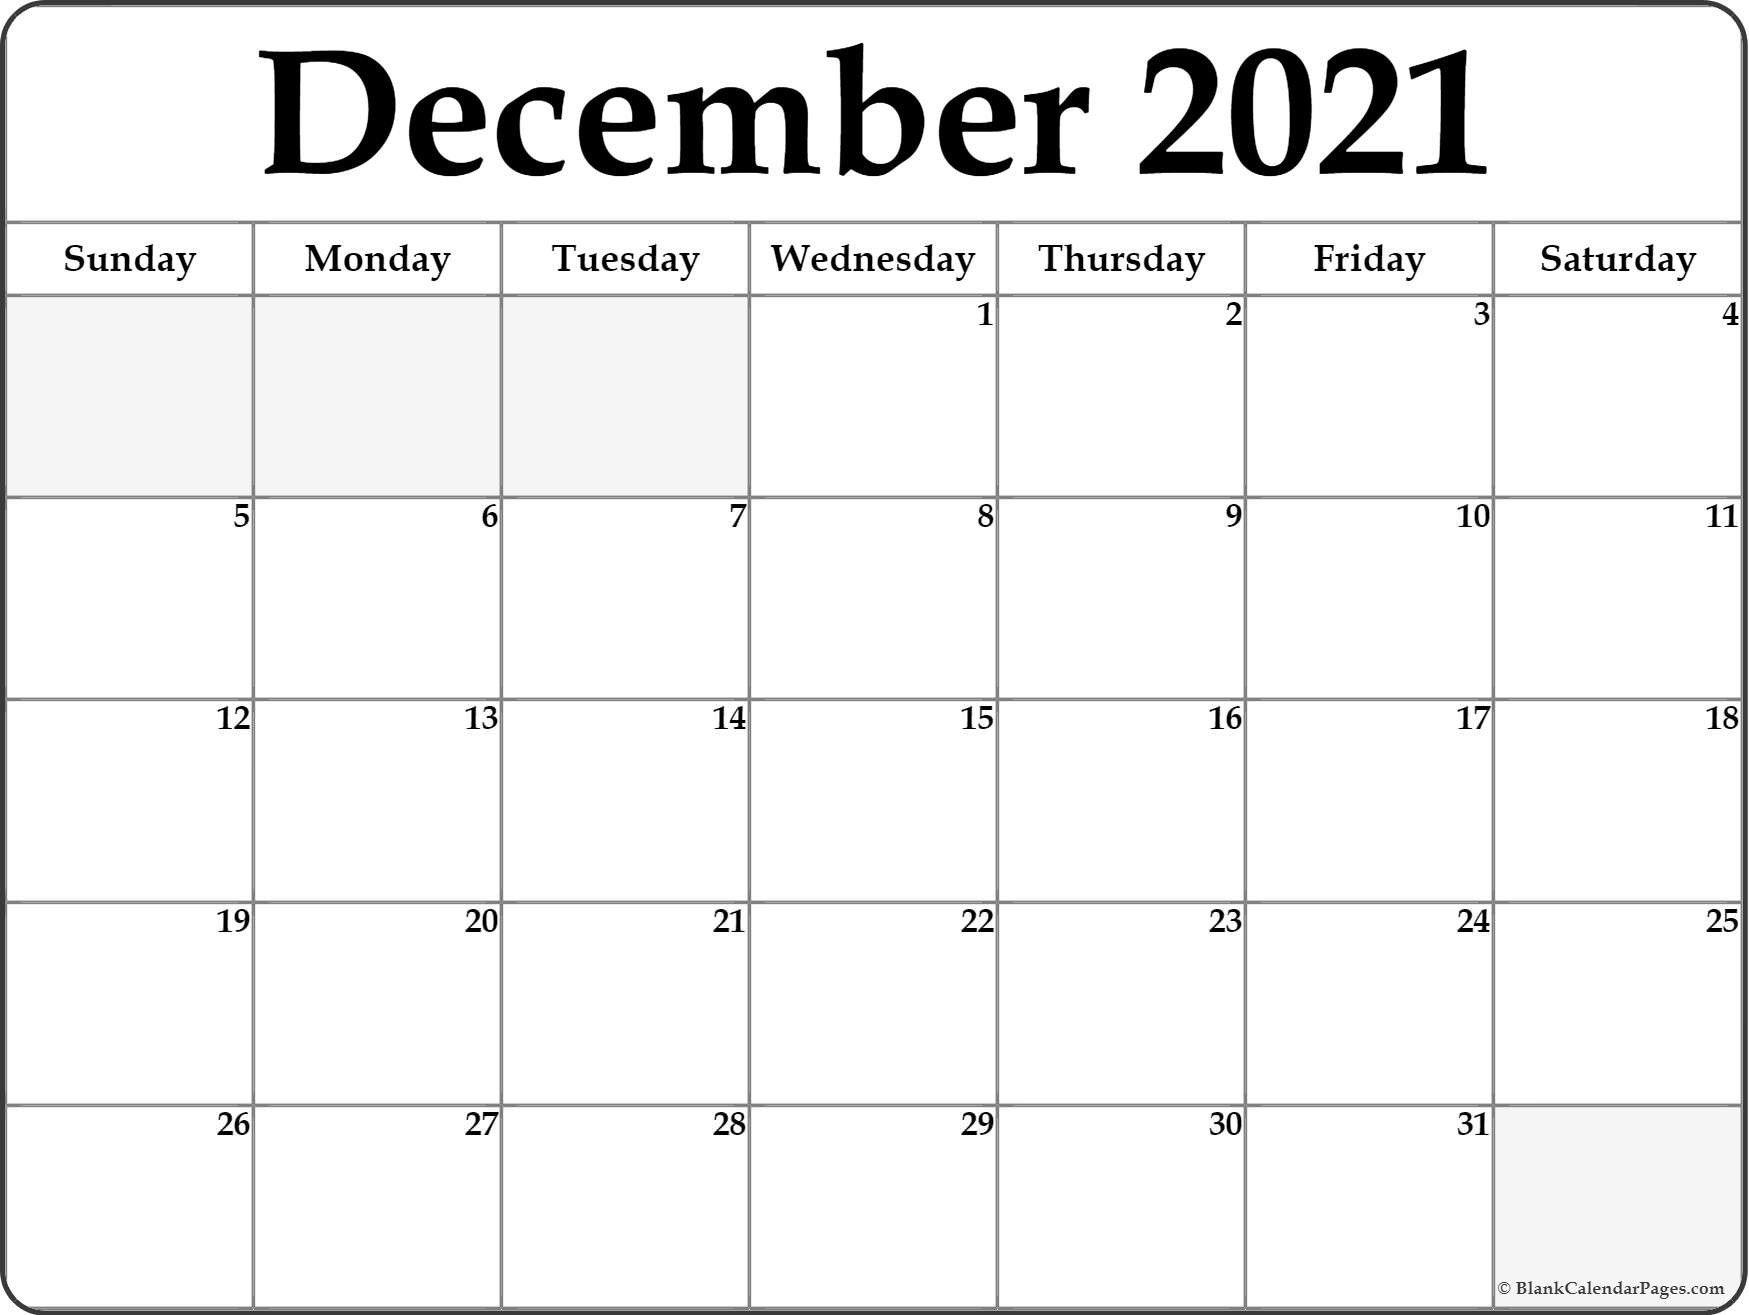 Printable Calendar For December 2021 december 2021 blank calendar templates december 2021 blank